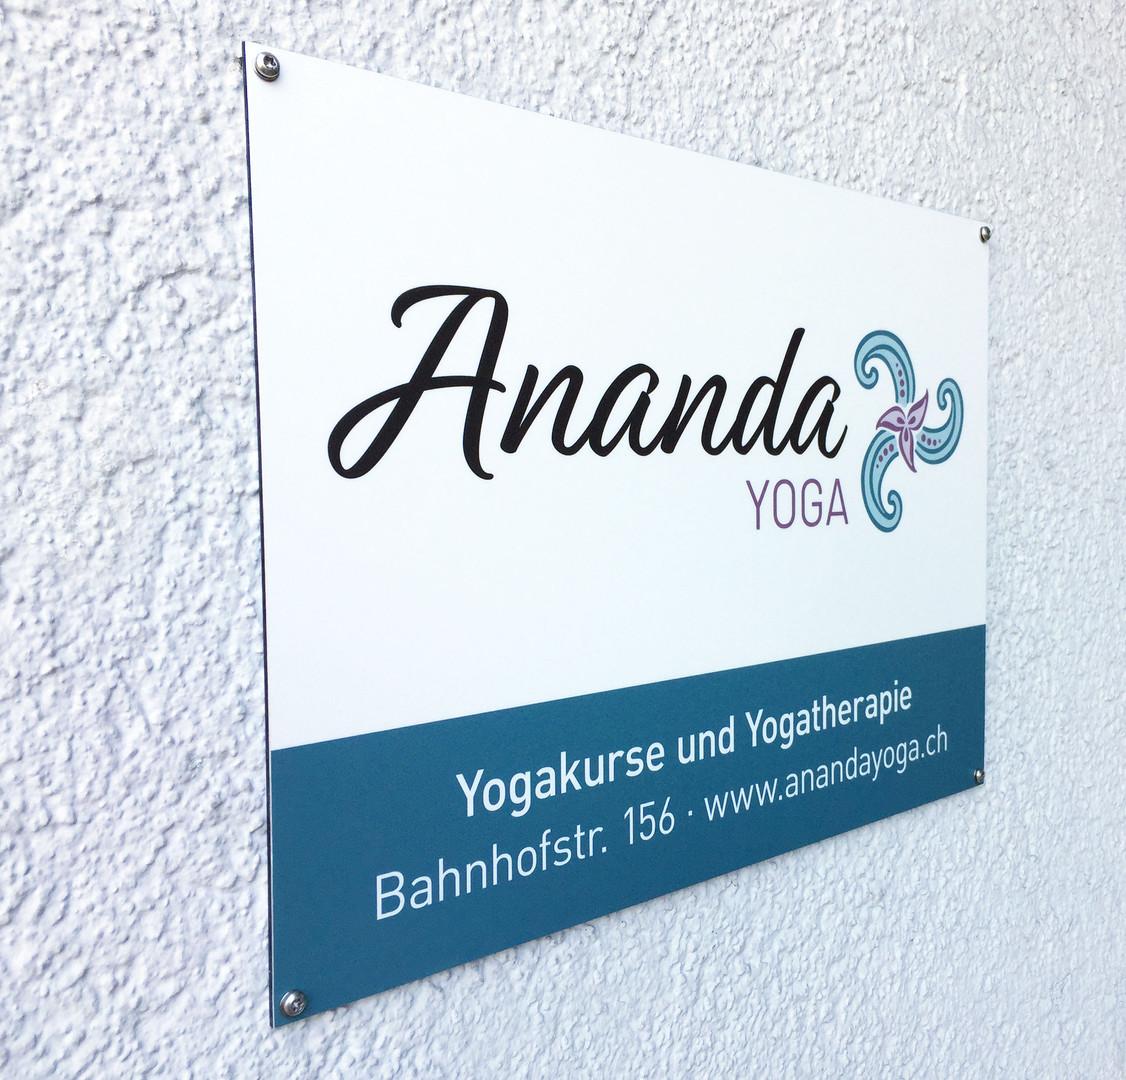 Ananda Yoga, CH-Wetzikon